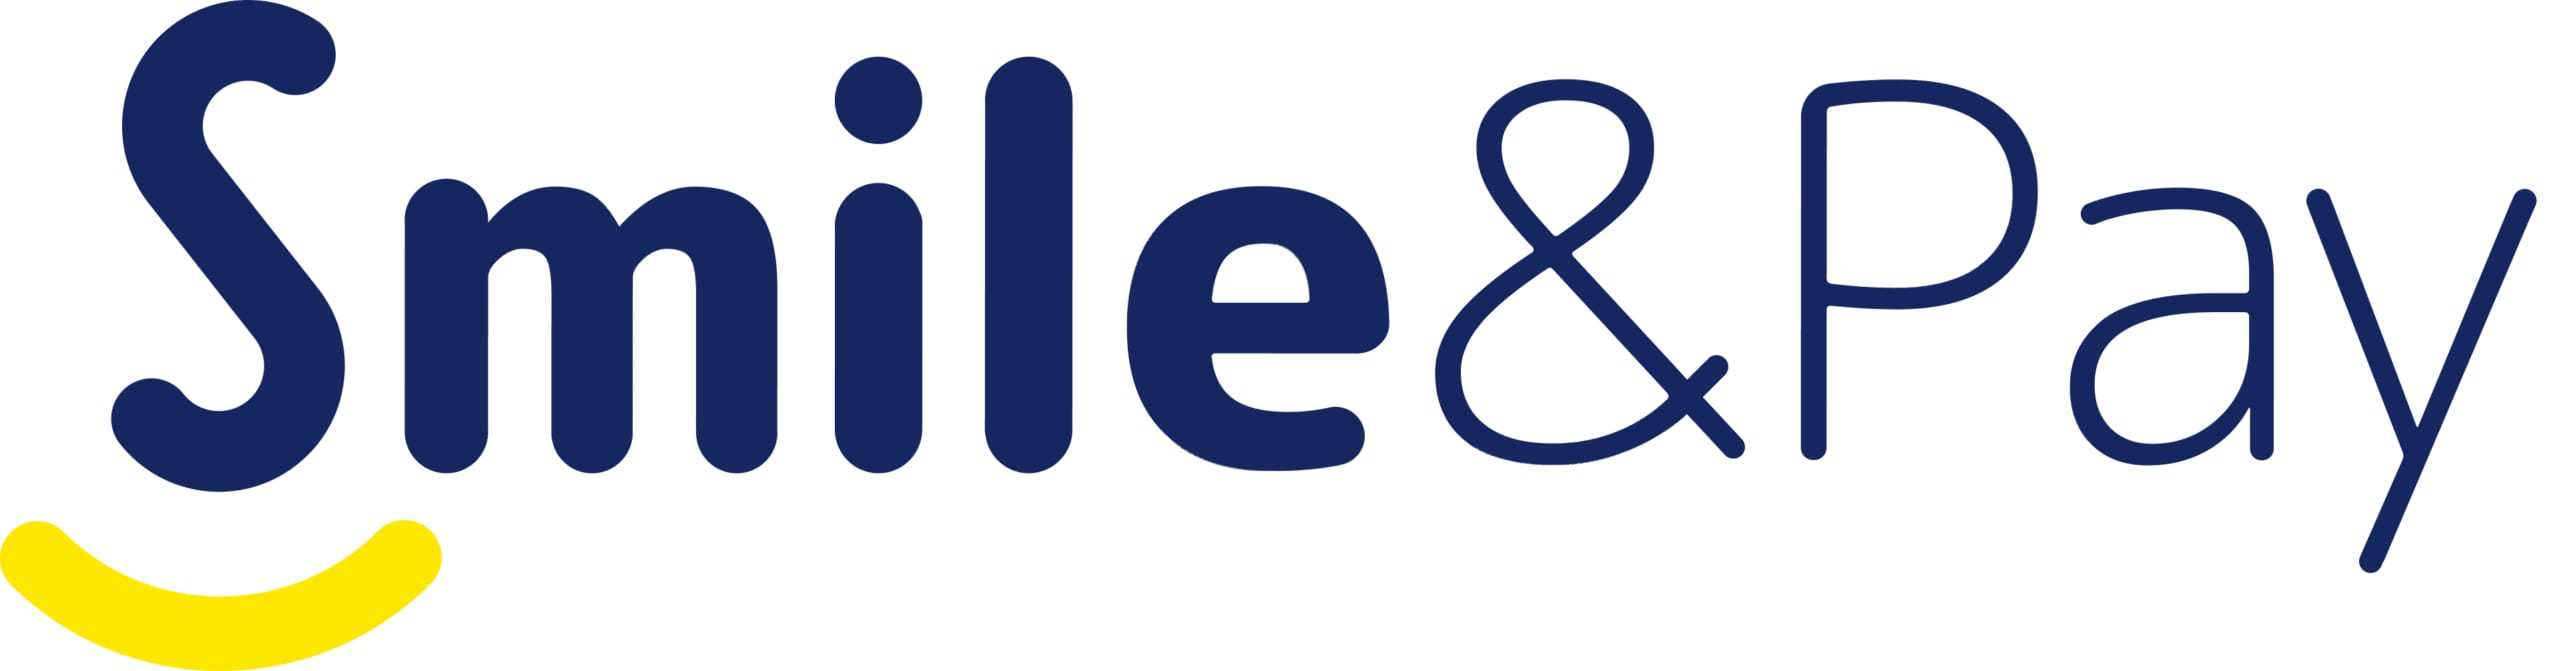 smileandpay logo